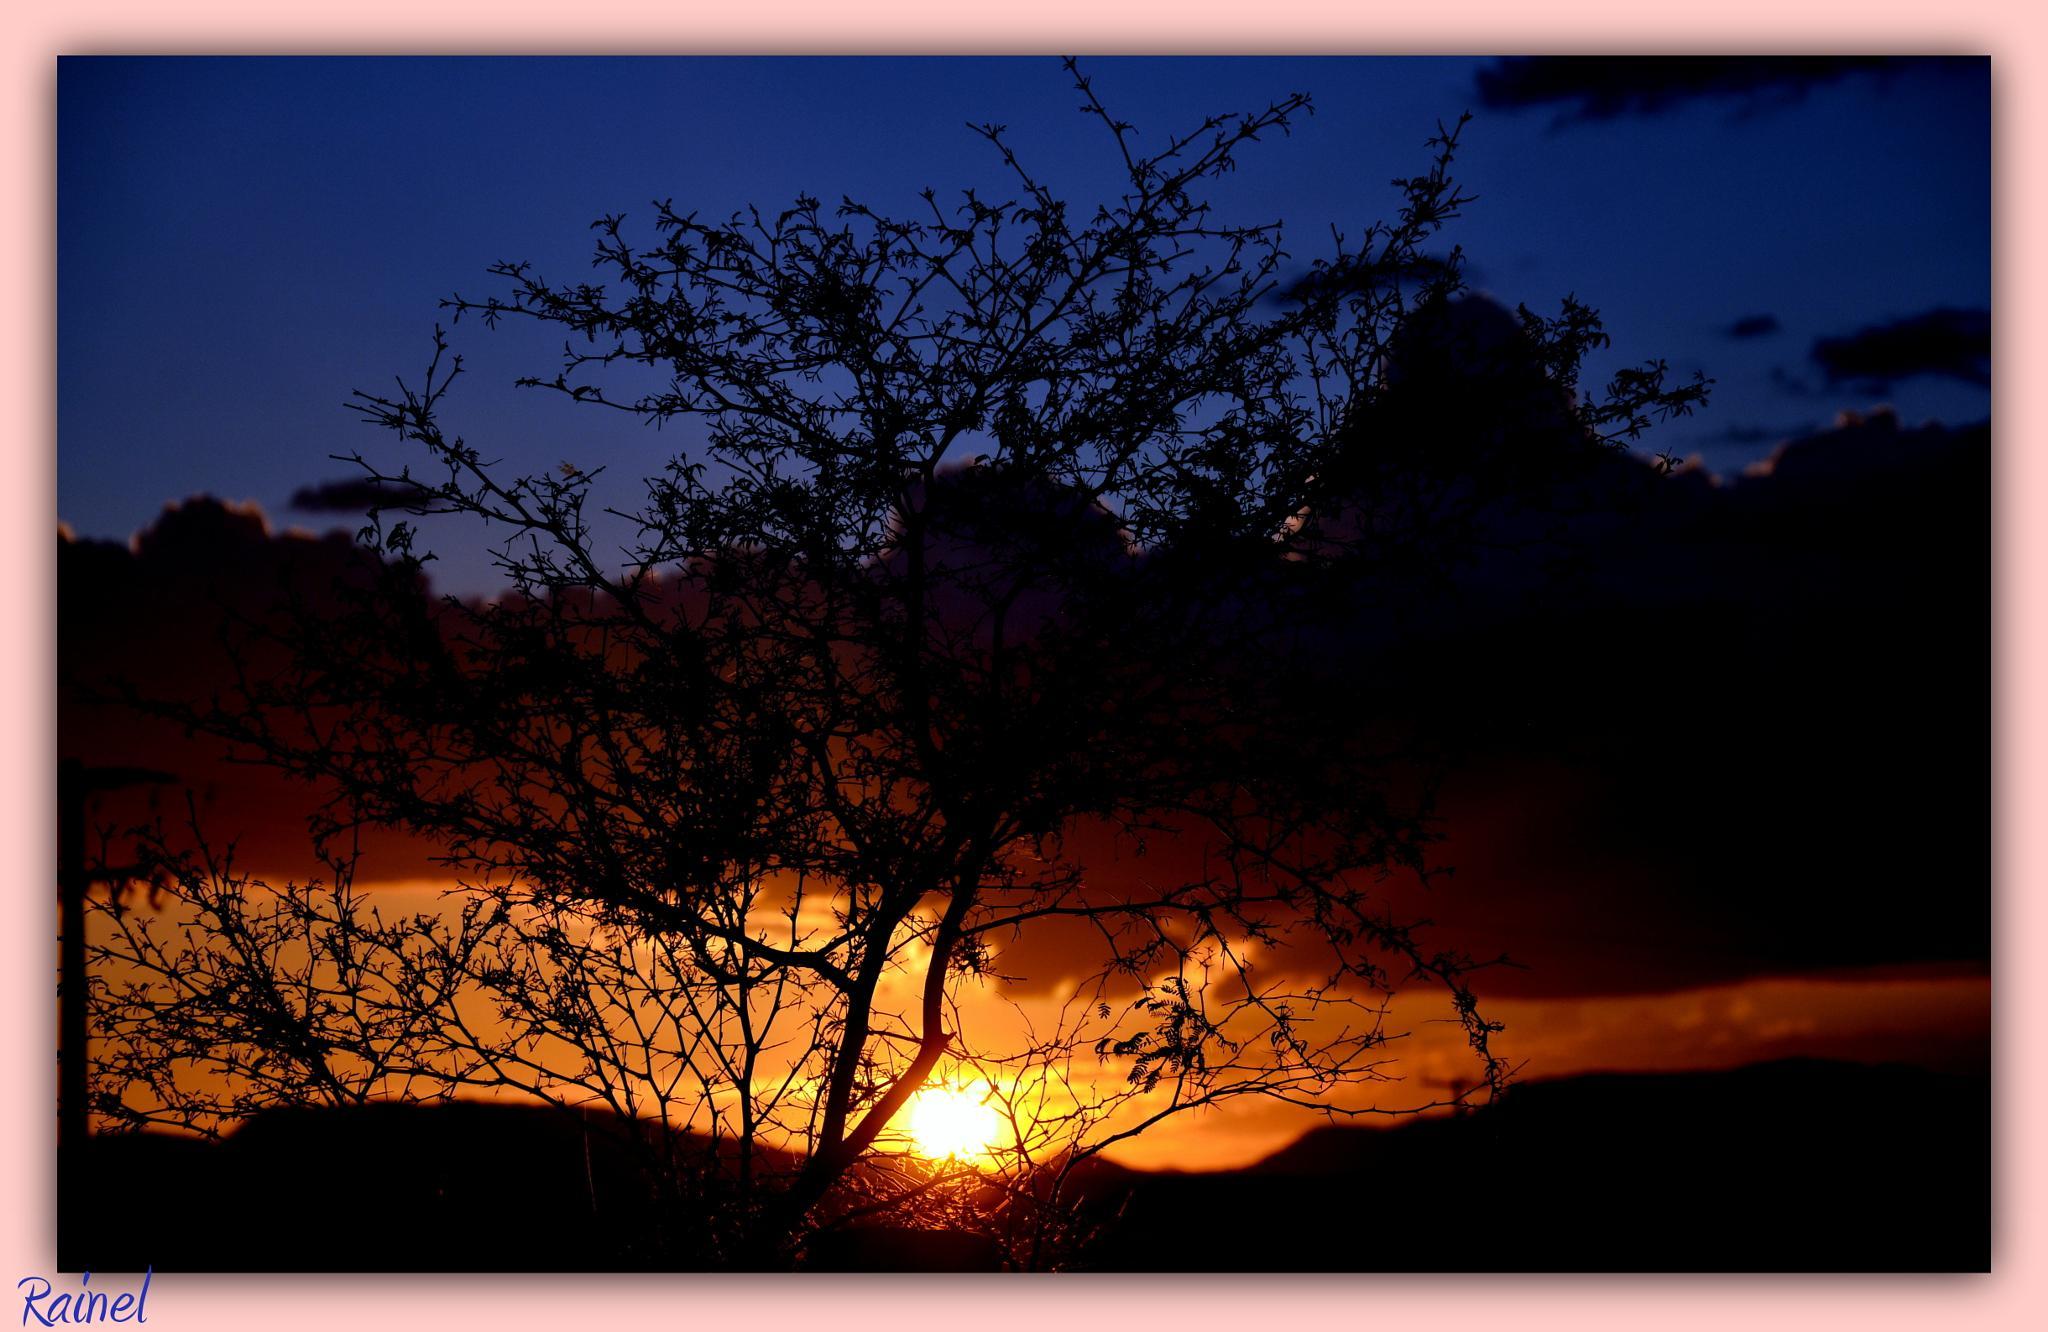 Por do Sol no oeste doRn by Rainel Dantas de Fontes